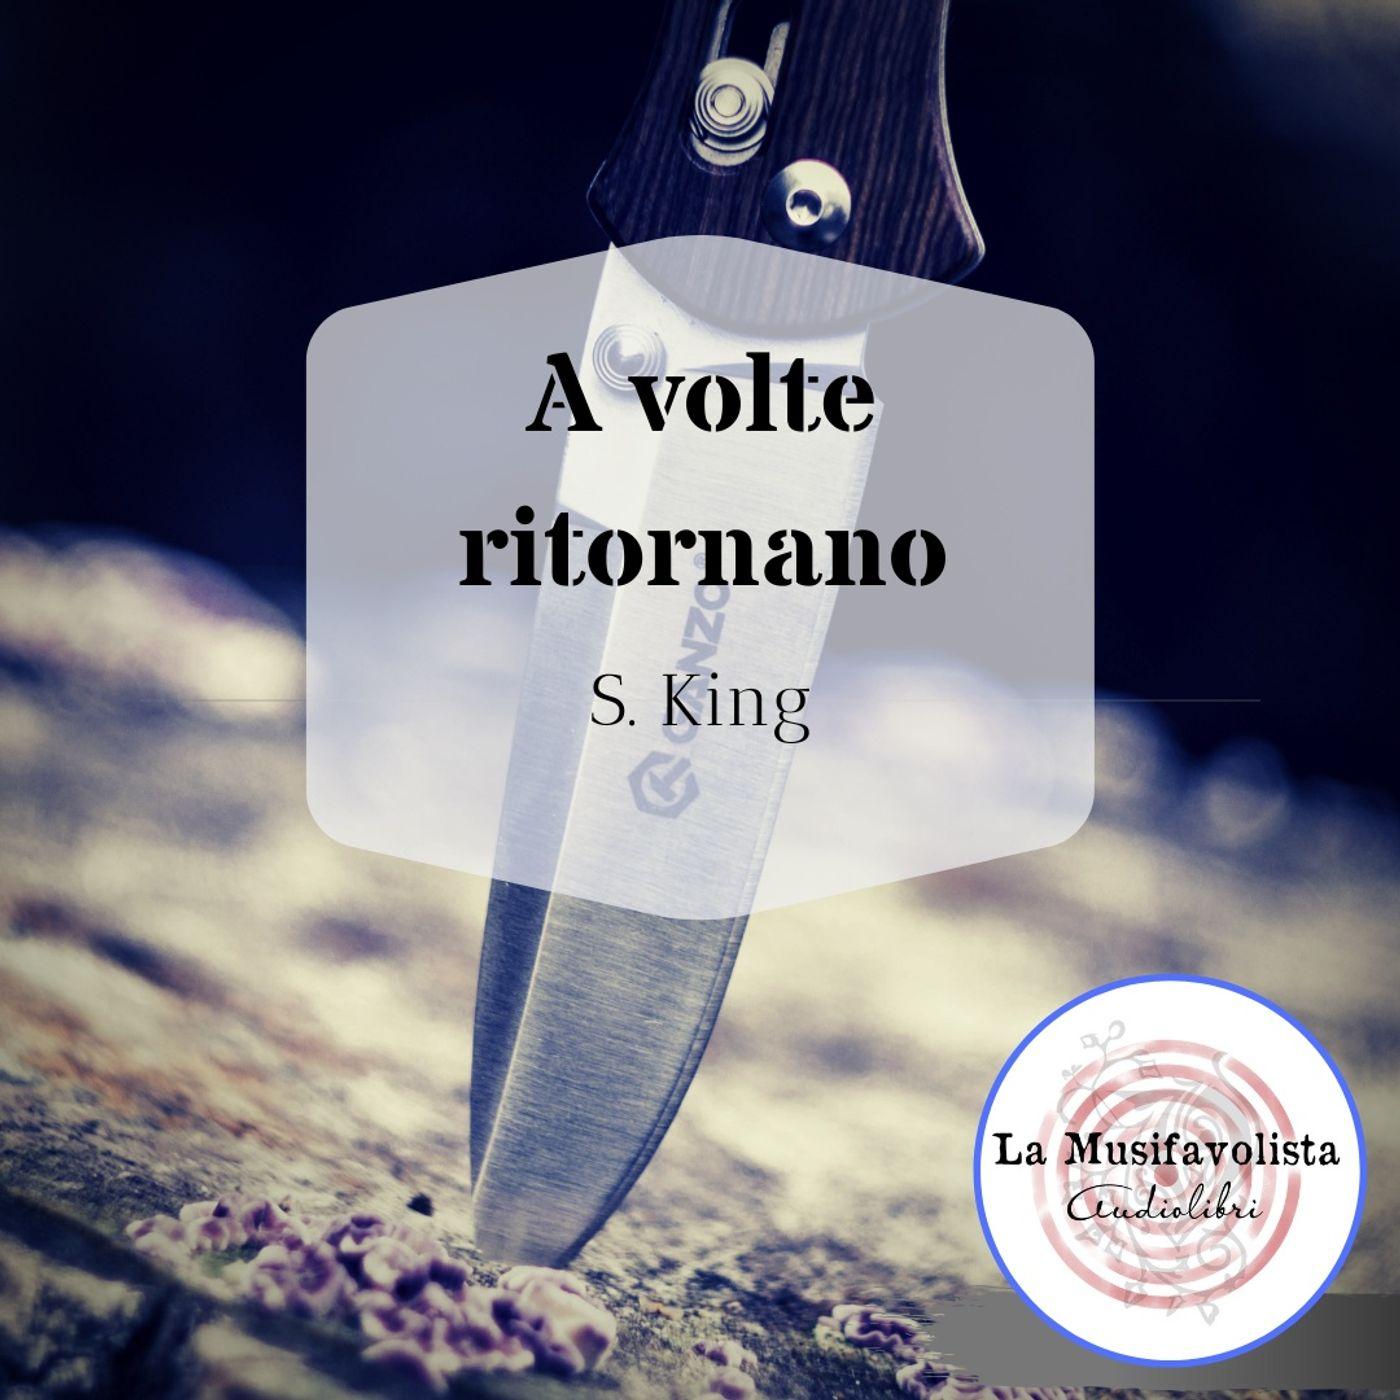 ✰ A VOLTE RITORNANO ✰ Stephen King  ✰ Soft spoken reading ✰